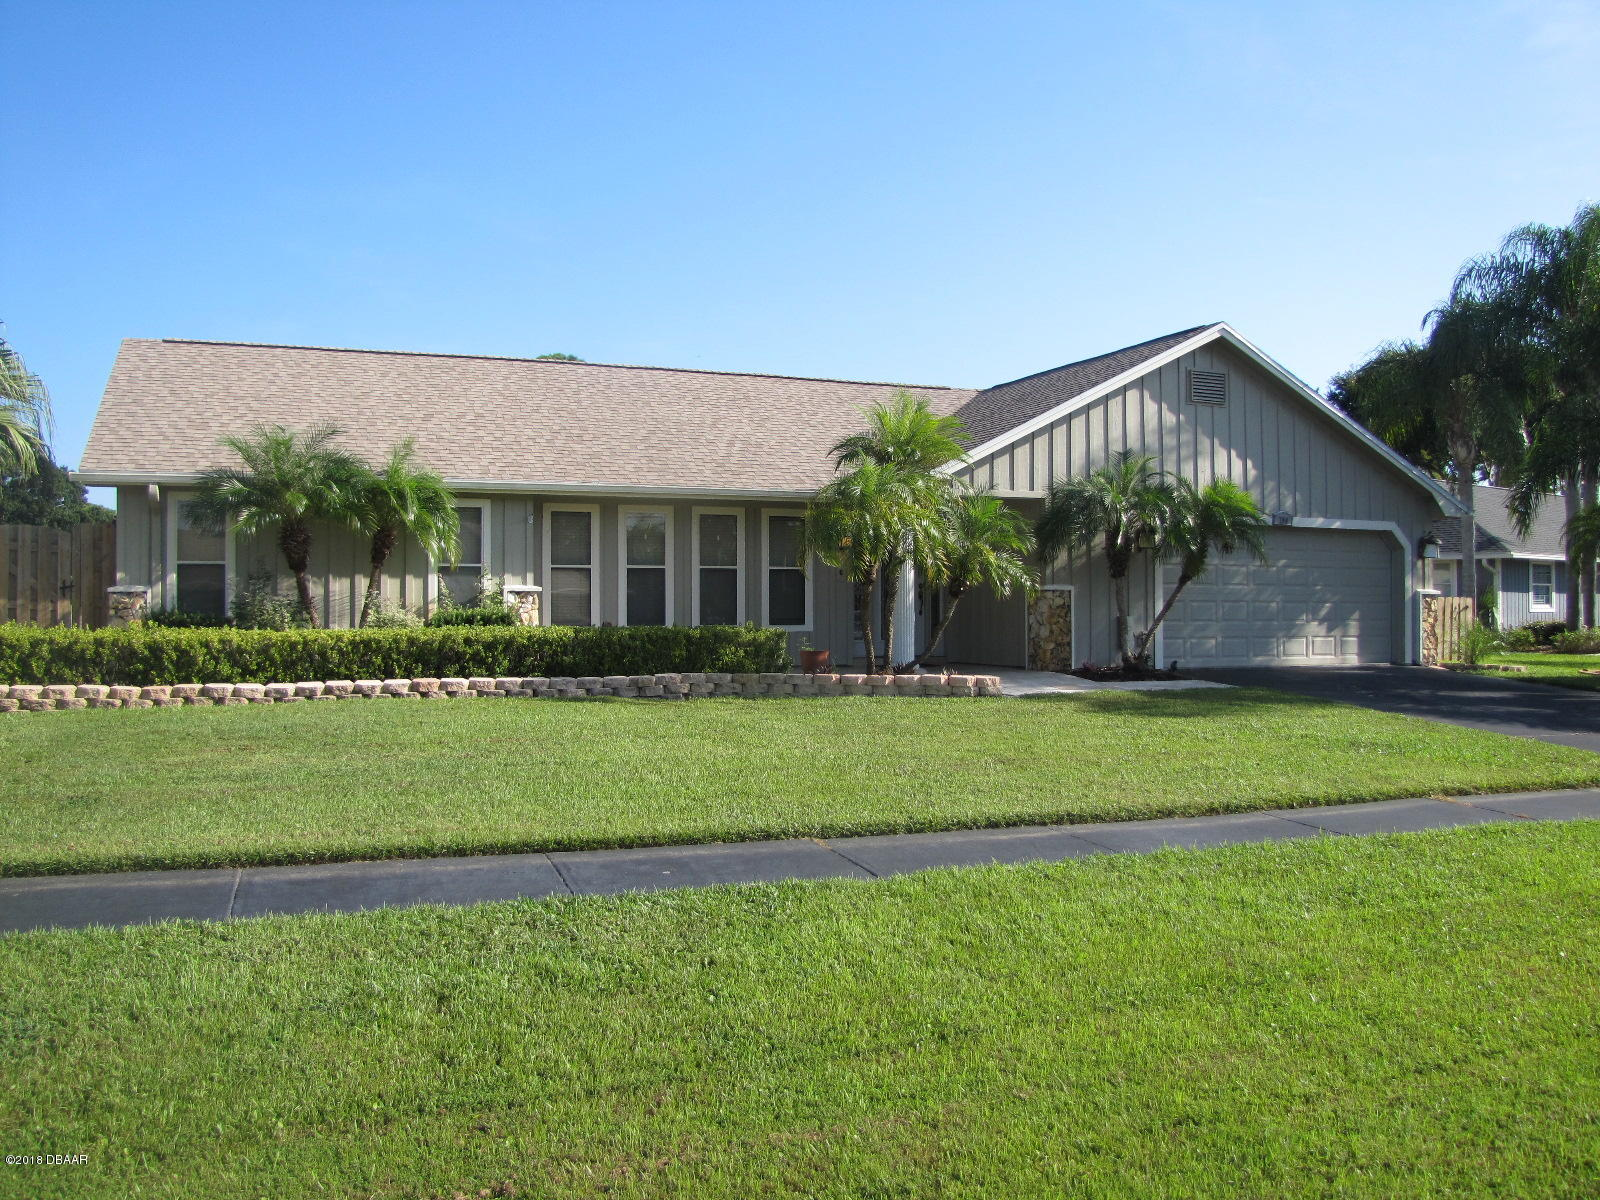 Photo of 704 Pelican Bay Drive, Daytona Beach, FL 32119